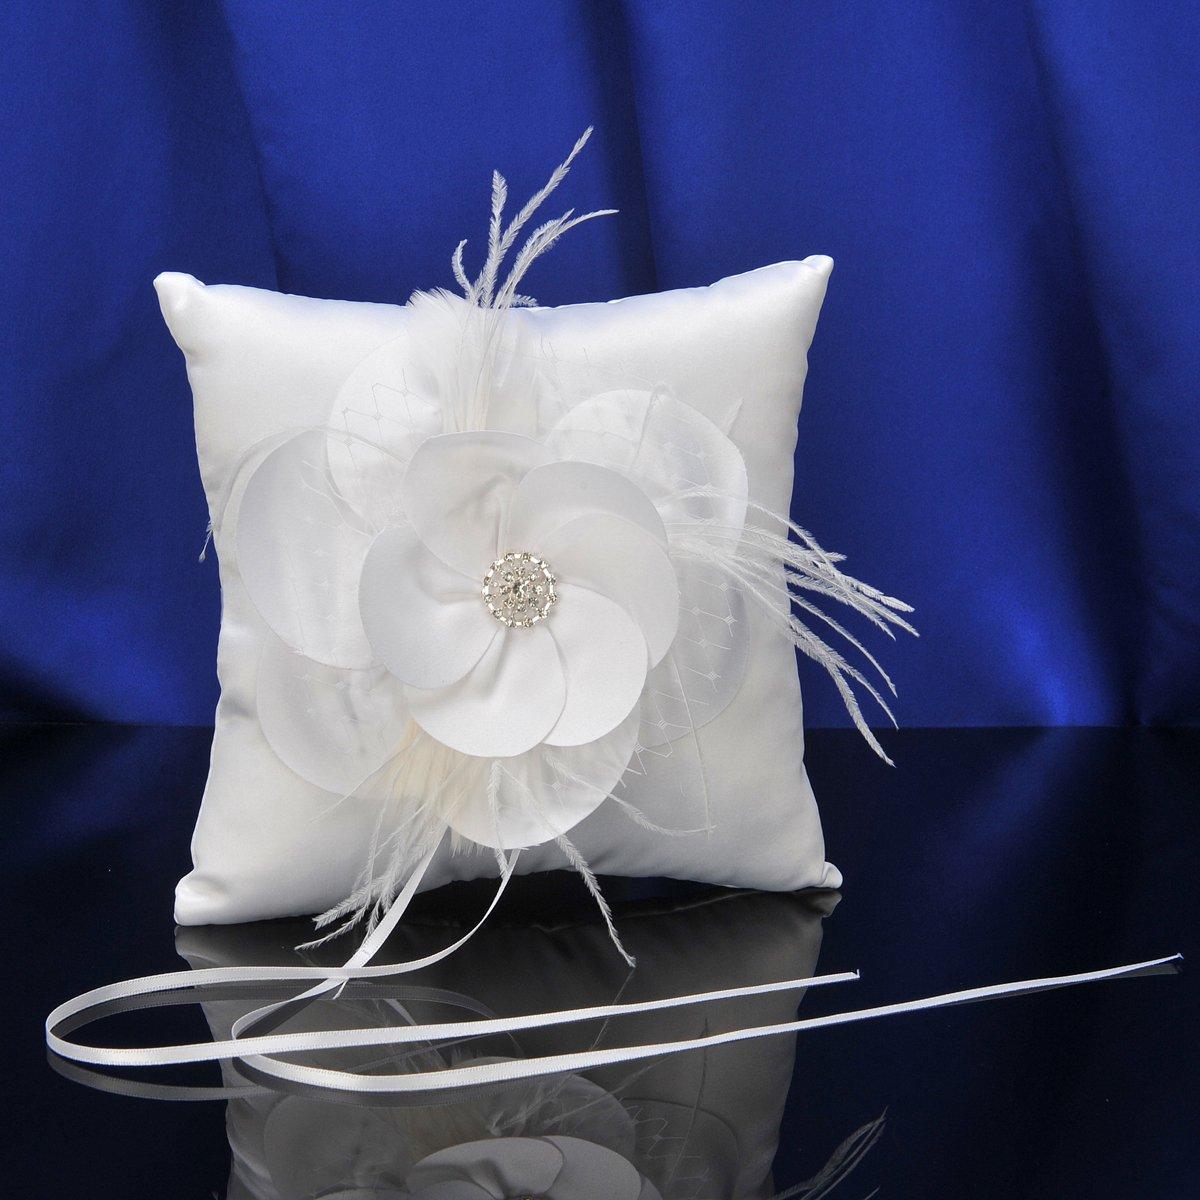 topwedding blanc satin ring kissen g nstig online kaufen. Black Bedroom Furniture Sets. Home Design Ideas